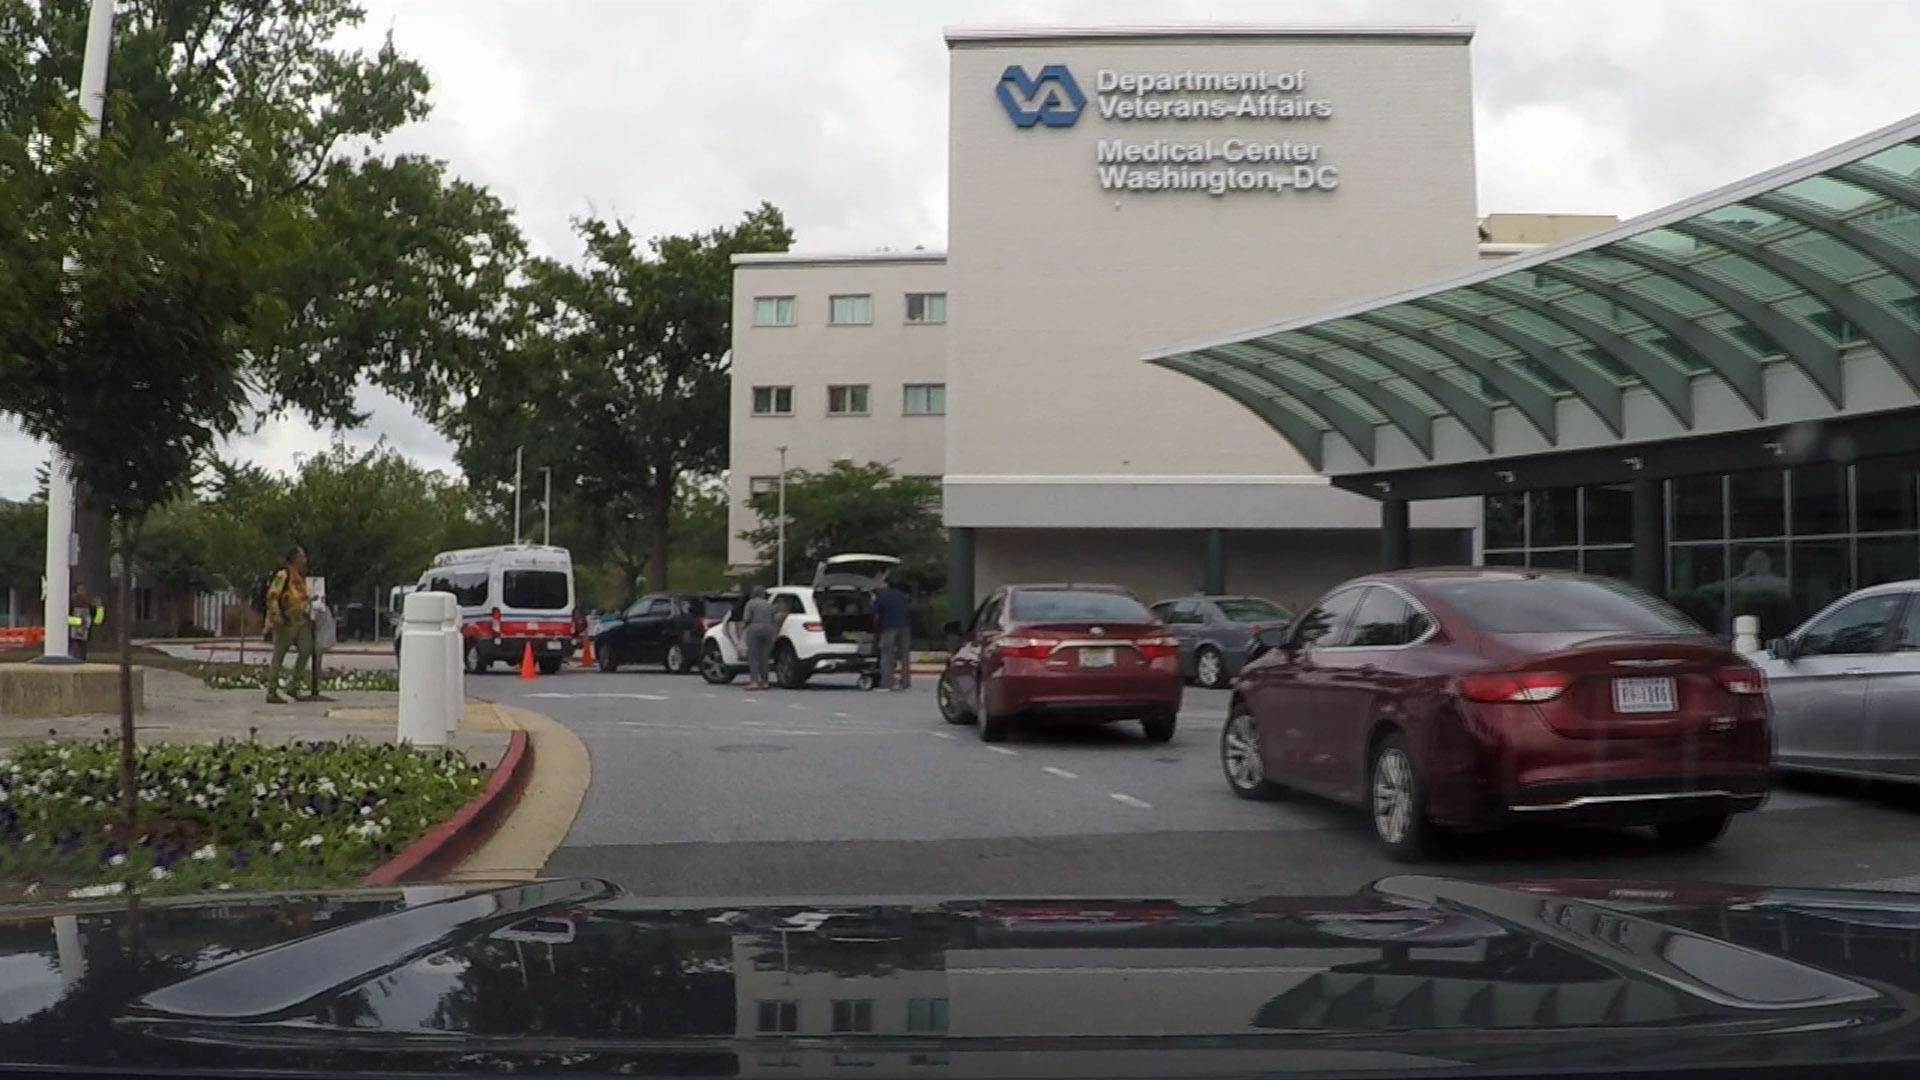 Feds Review Breast Cancer Screening Delays at DC VA Medical Center - NBC4 Washington